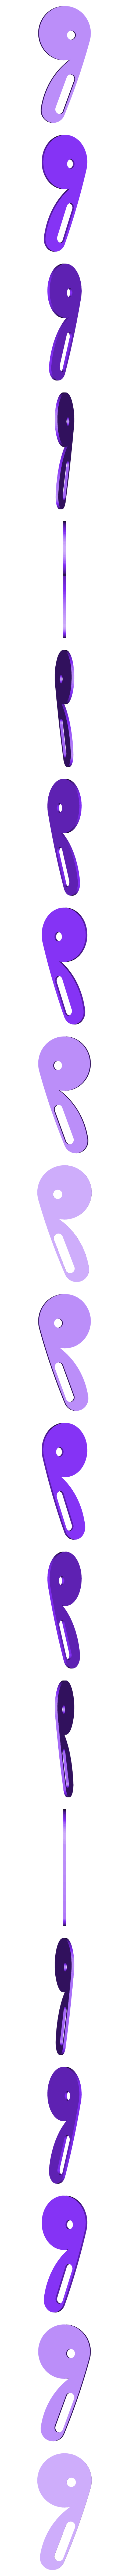 Foot_Right.stl Download free STL file Windup Bunny • 3D printing design, gzumwalt